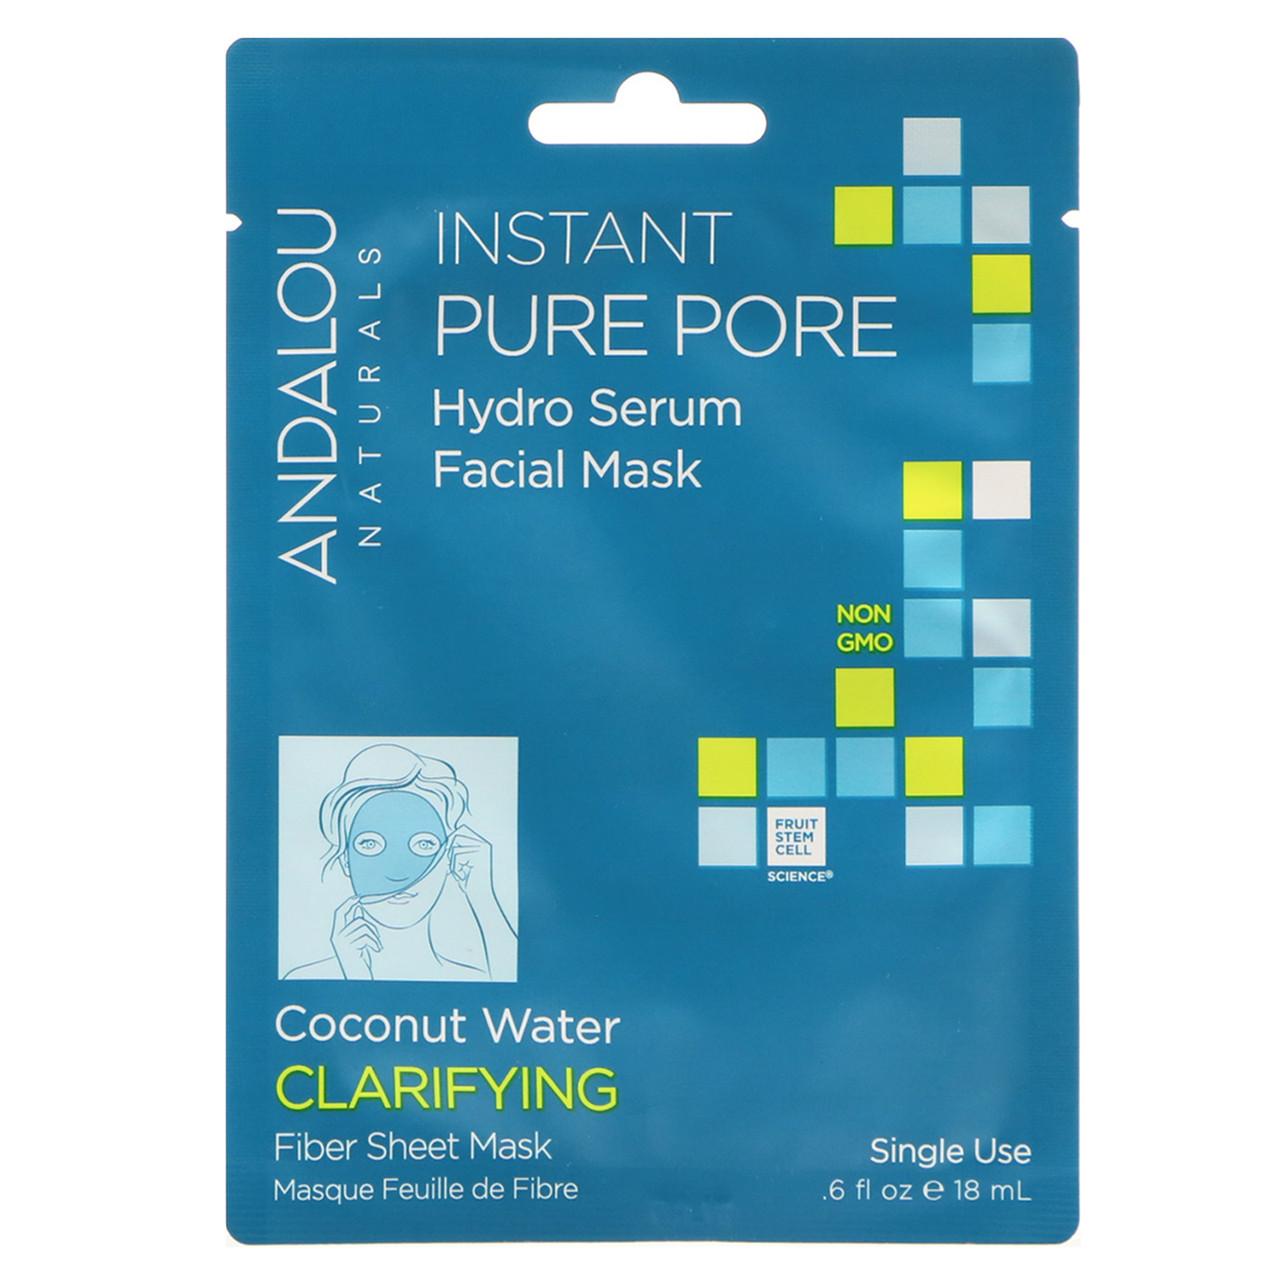 Andalou Naturals, Instant Pure Pore, Hydro Serum Facial Mask, 1 Single Use Fiber Sheet Mask, .6 fl oz (18 ml)